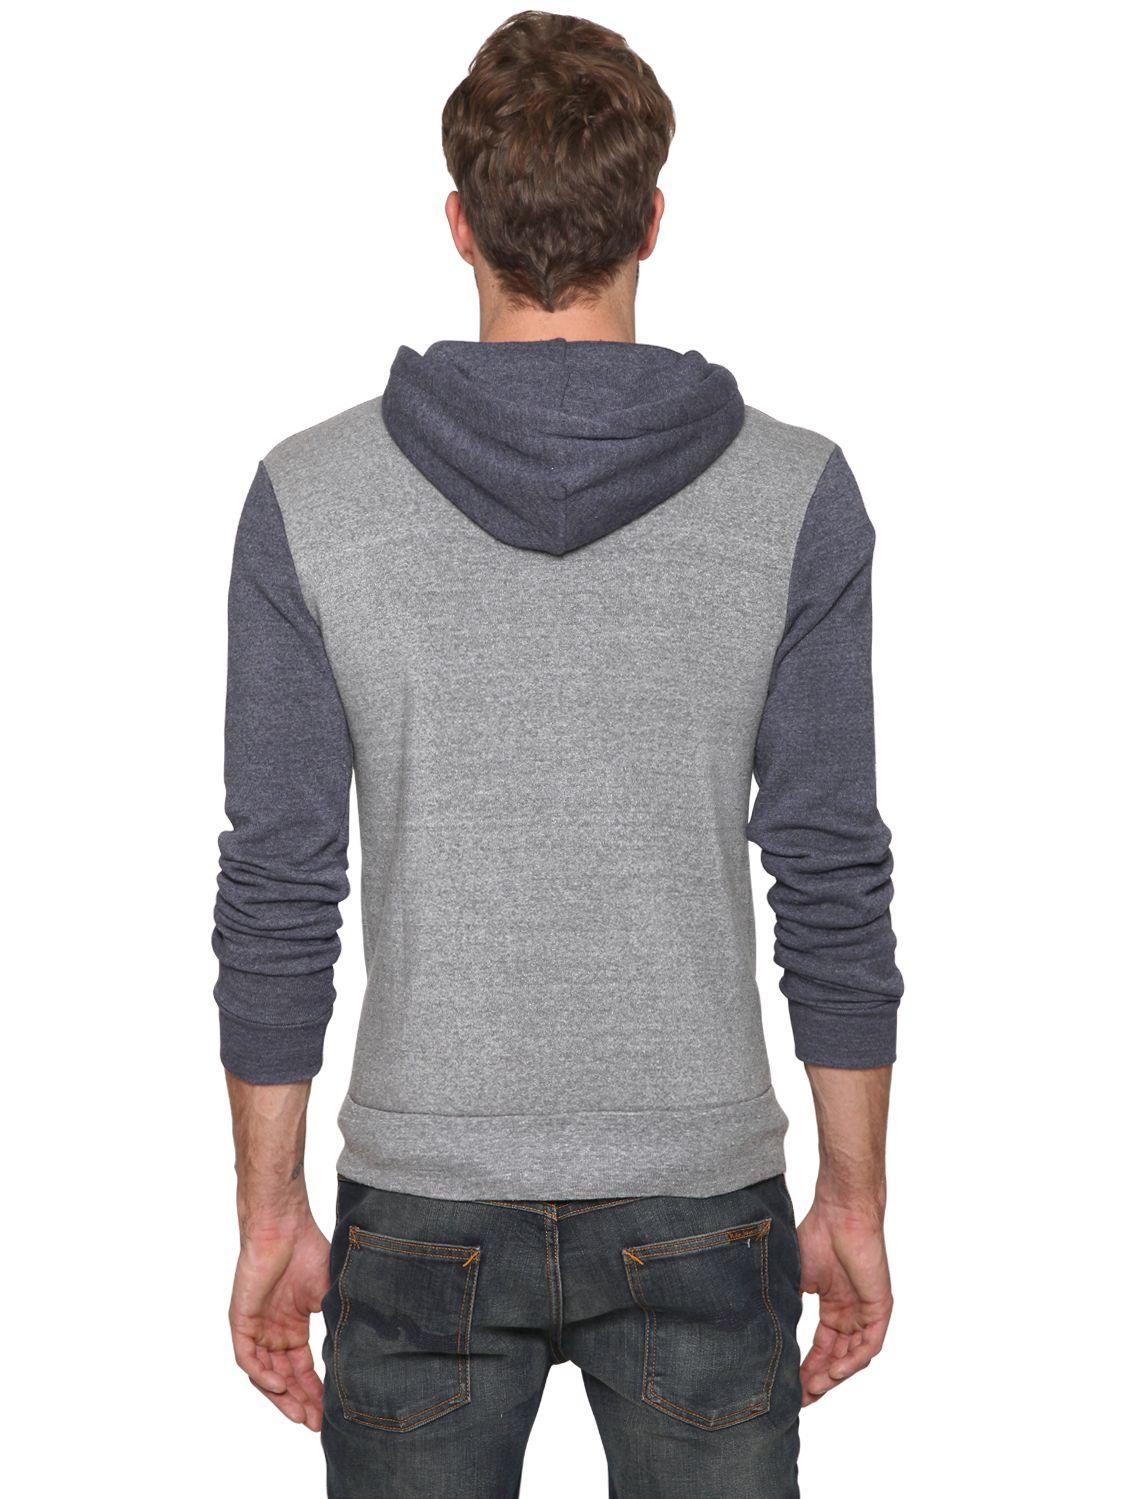 Techno hoodie